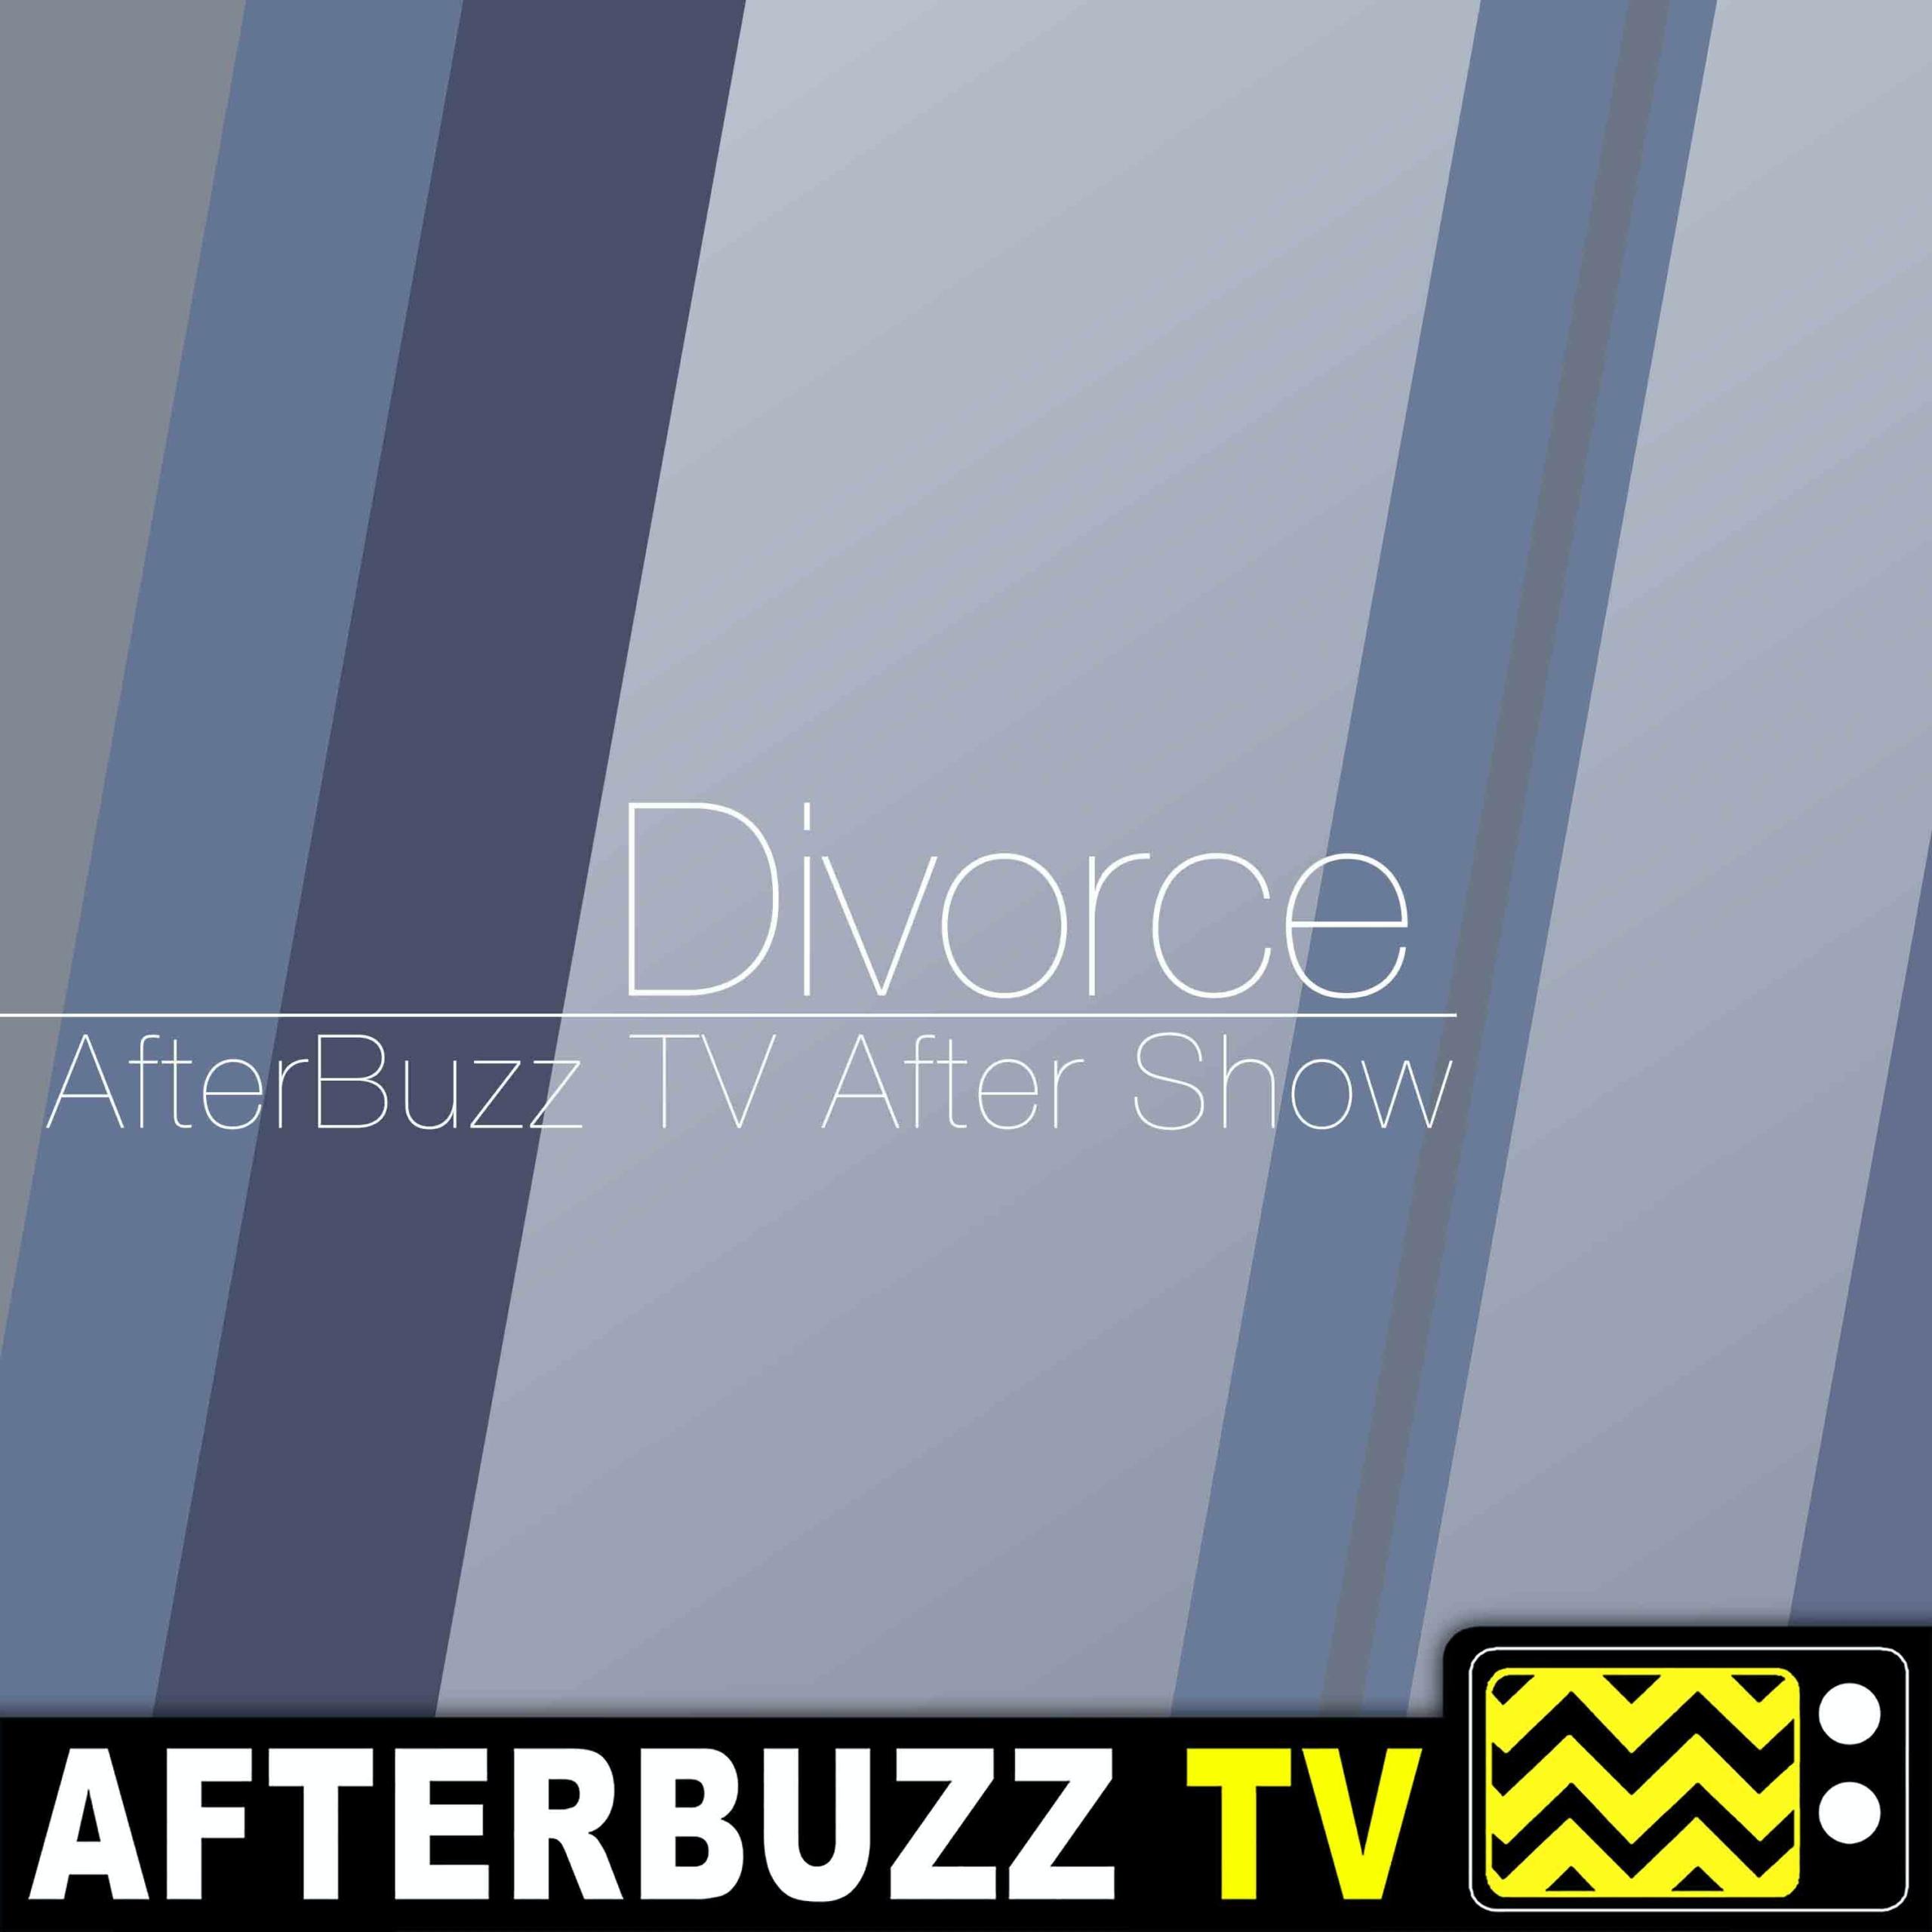 """Gaps & Bunches"" Season 3 Episode 3 'Divorce' Review"